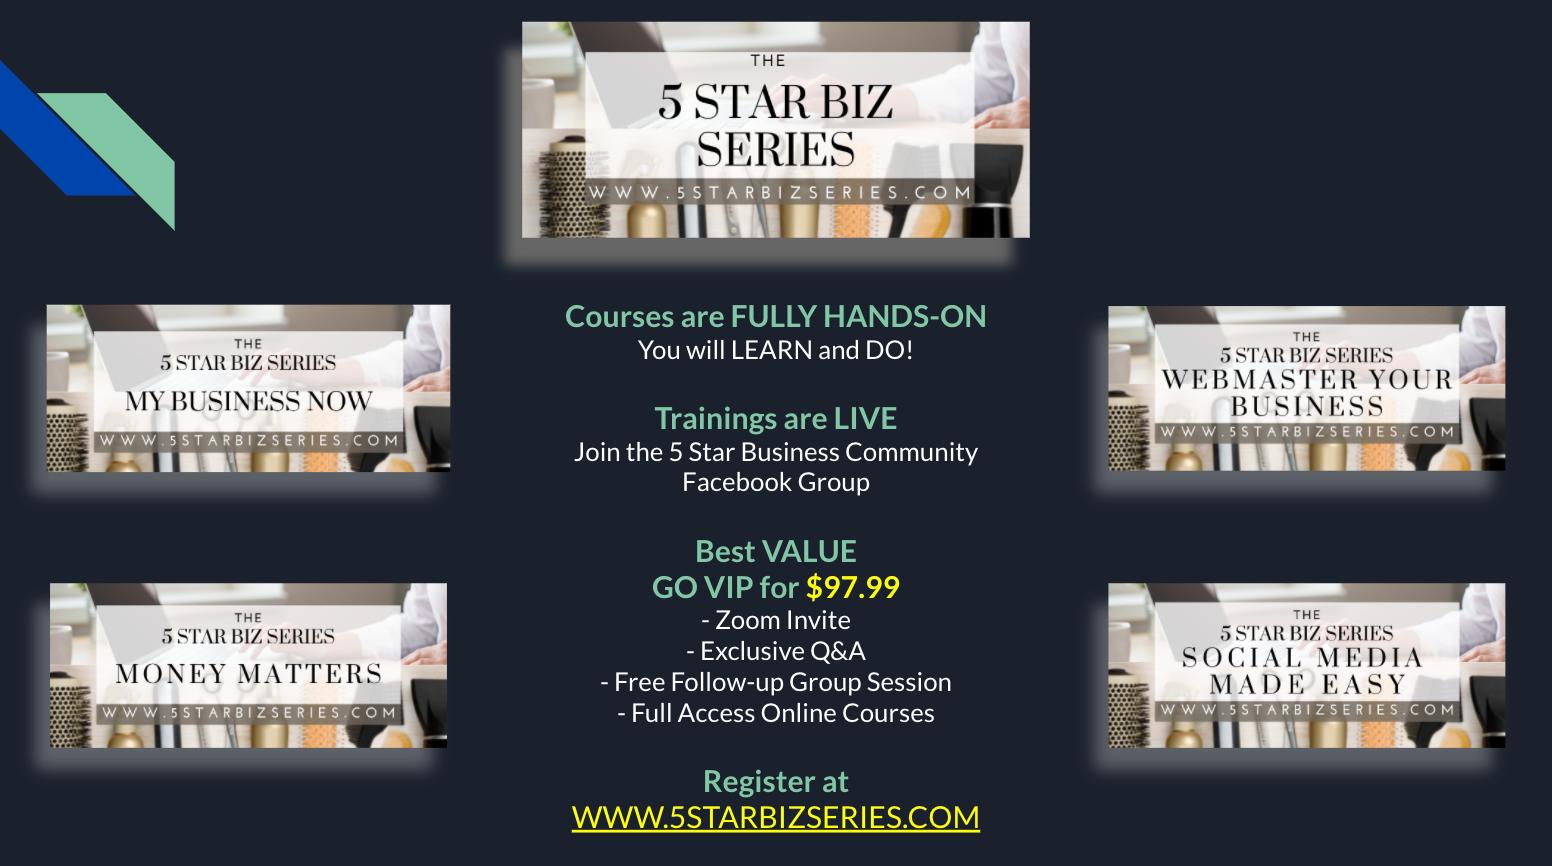 5 Star Biz Series Events